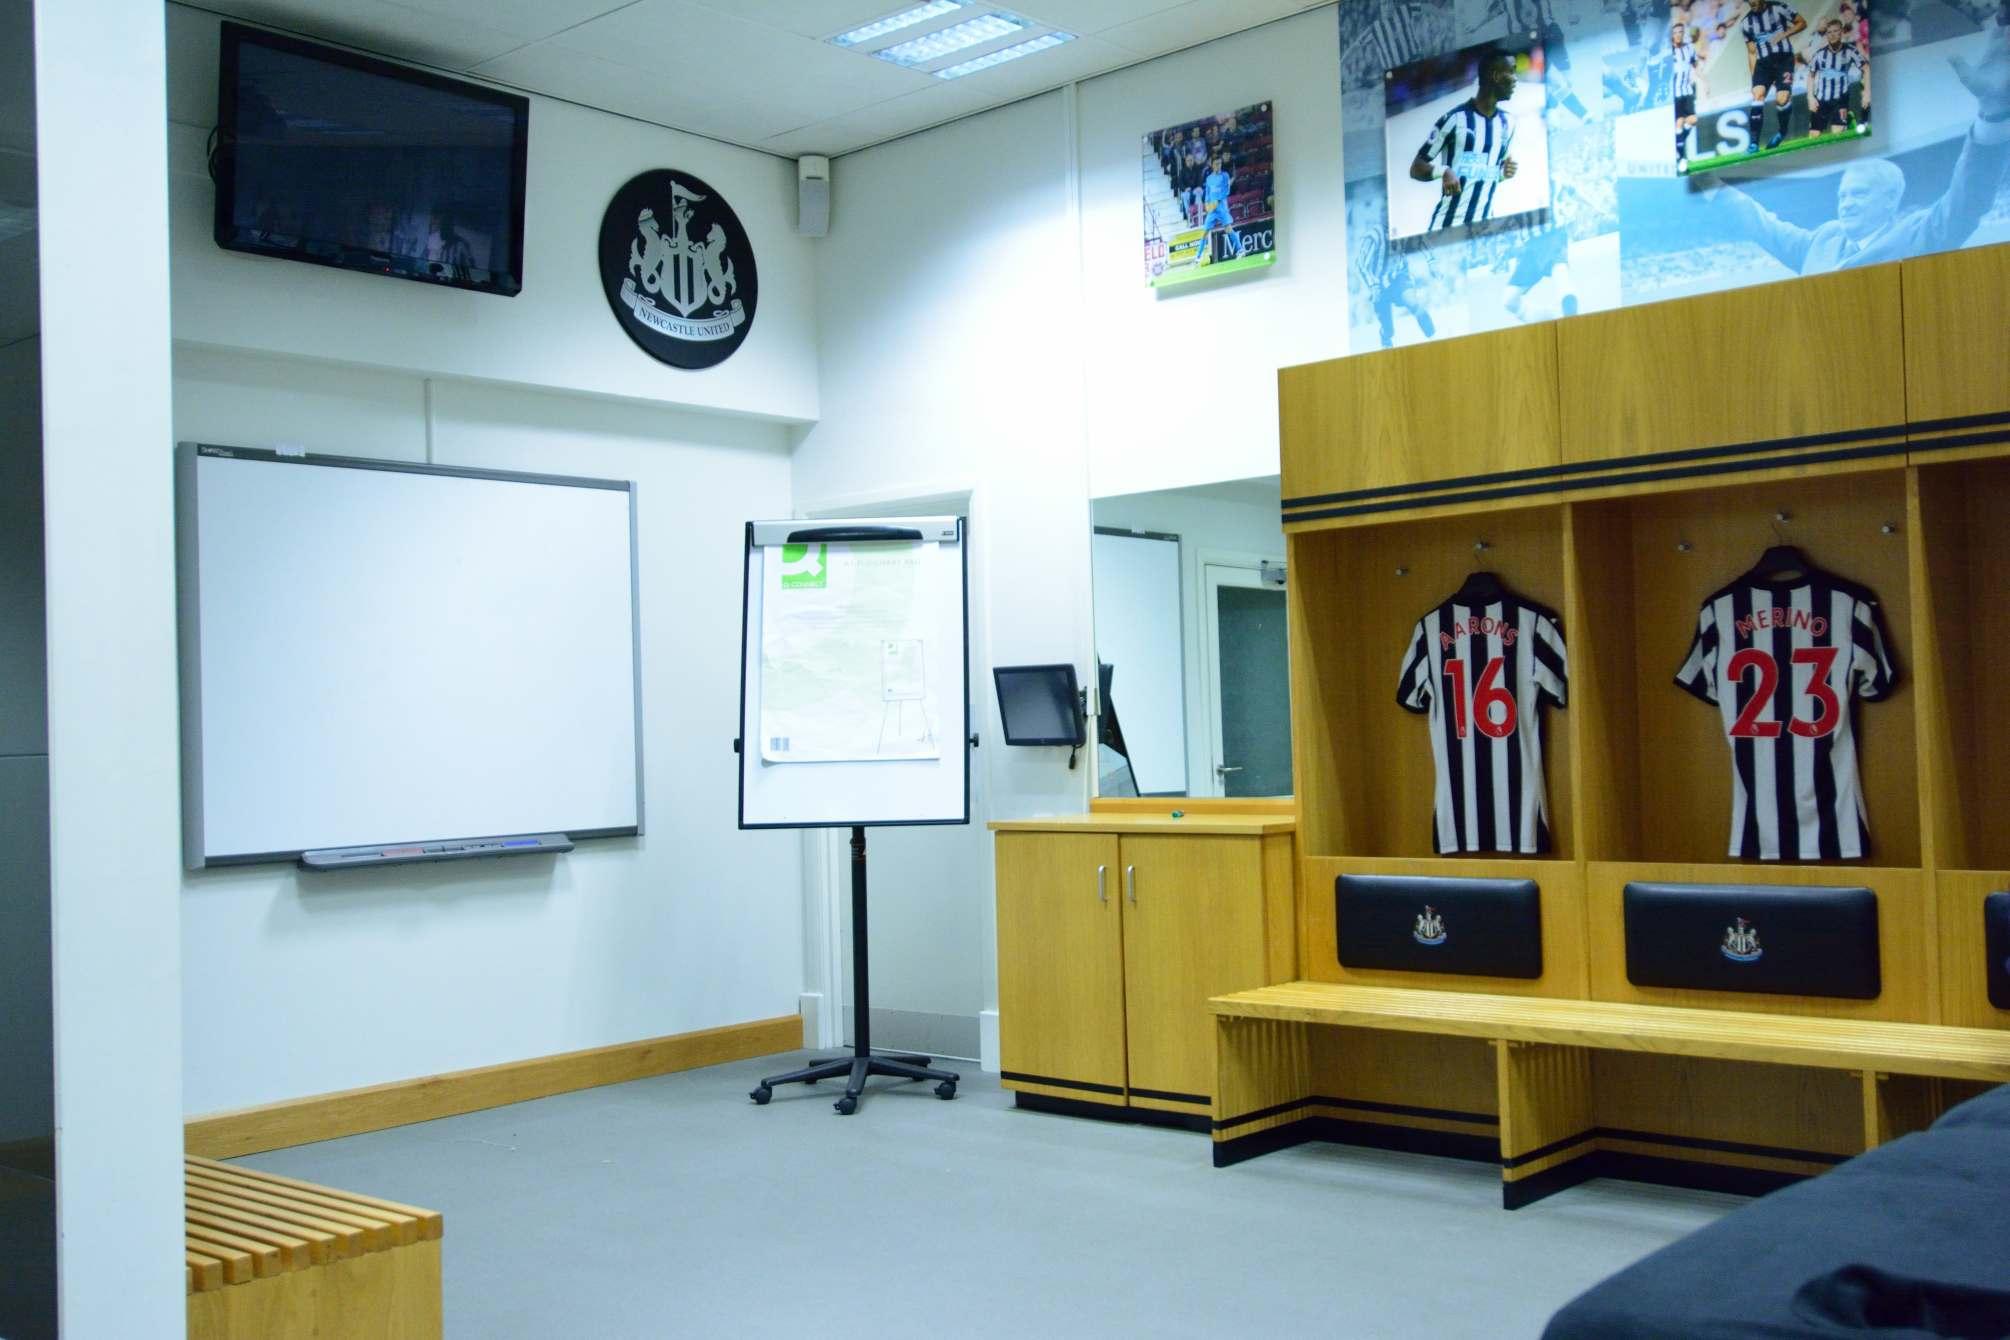 nufc tours11 Newcastle United Stadium Tours for Fans